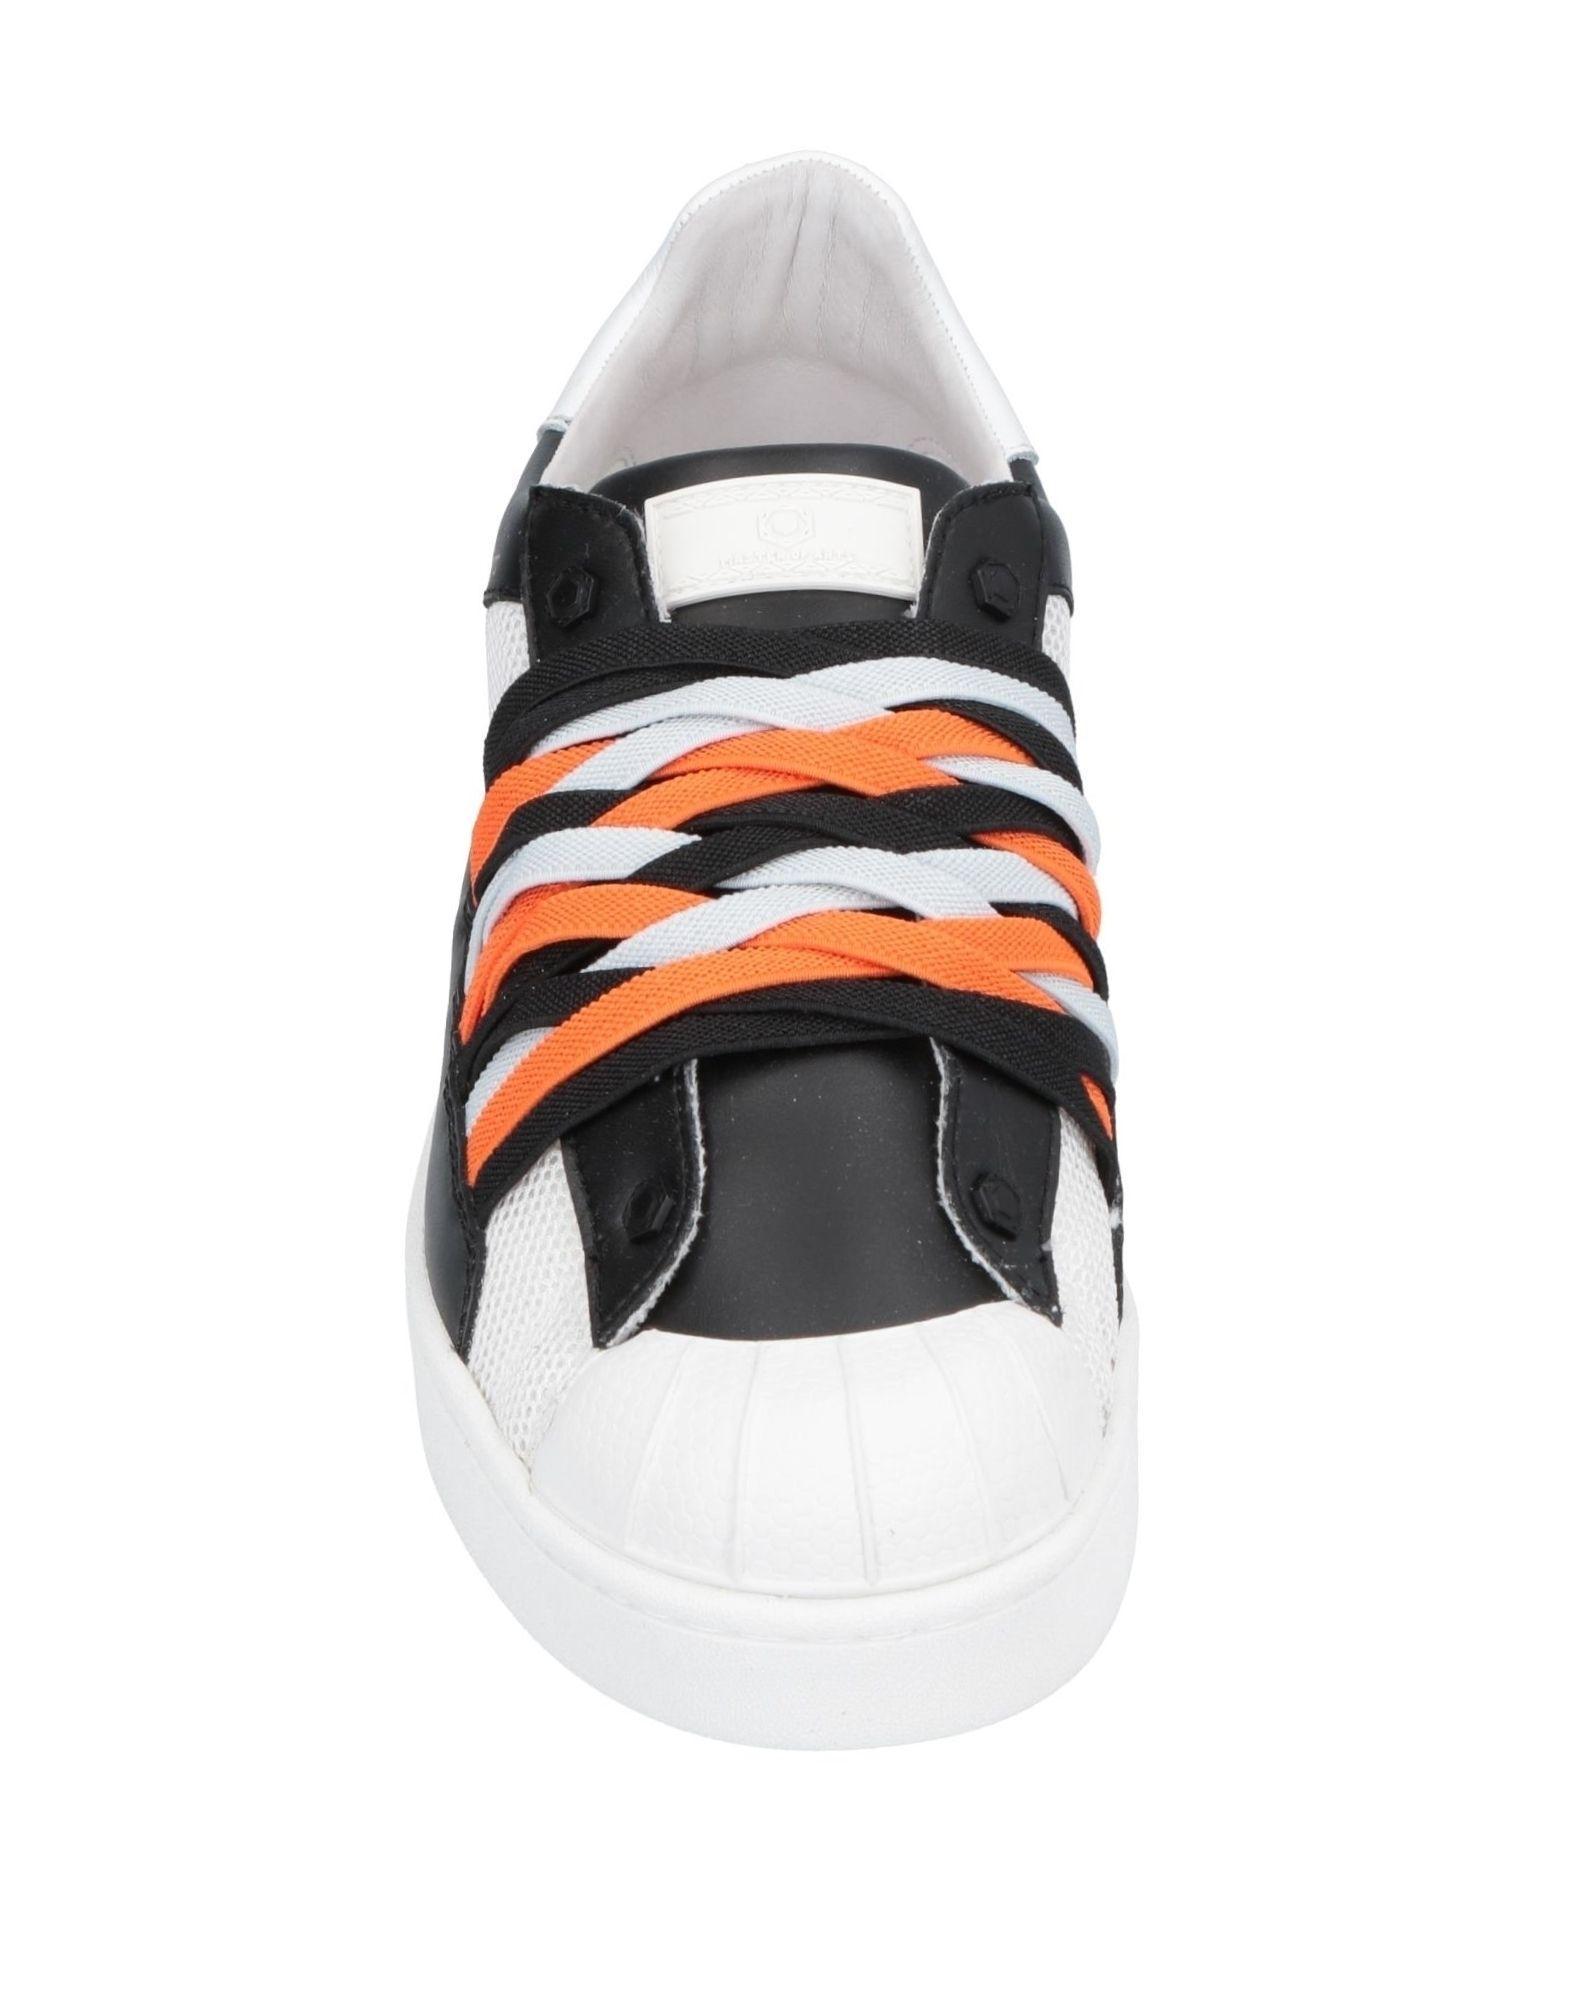 Sneakers & Deportivas MOA de hombre de color Negro